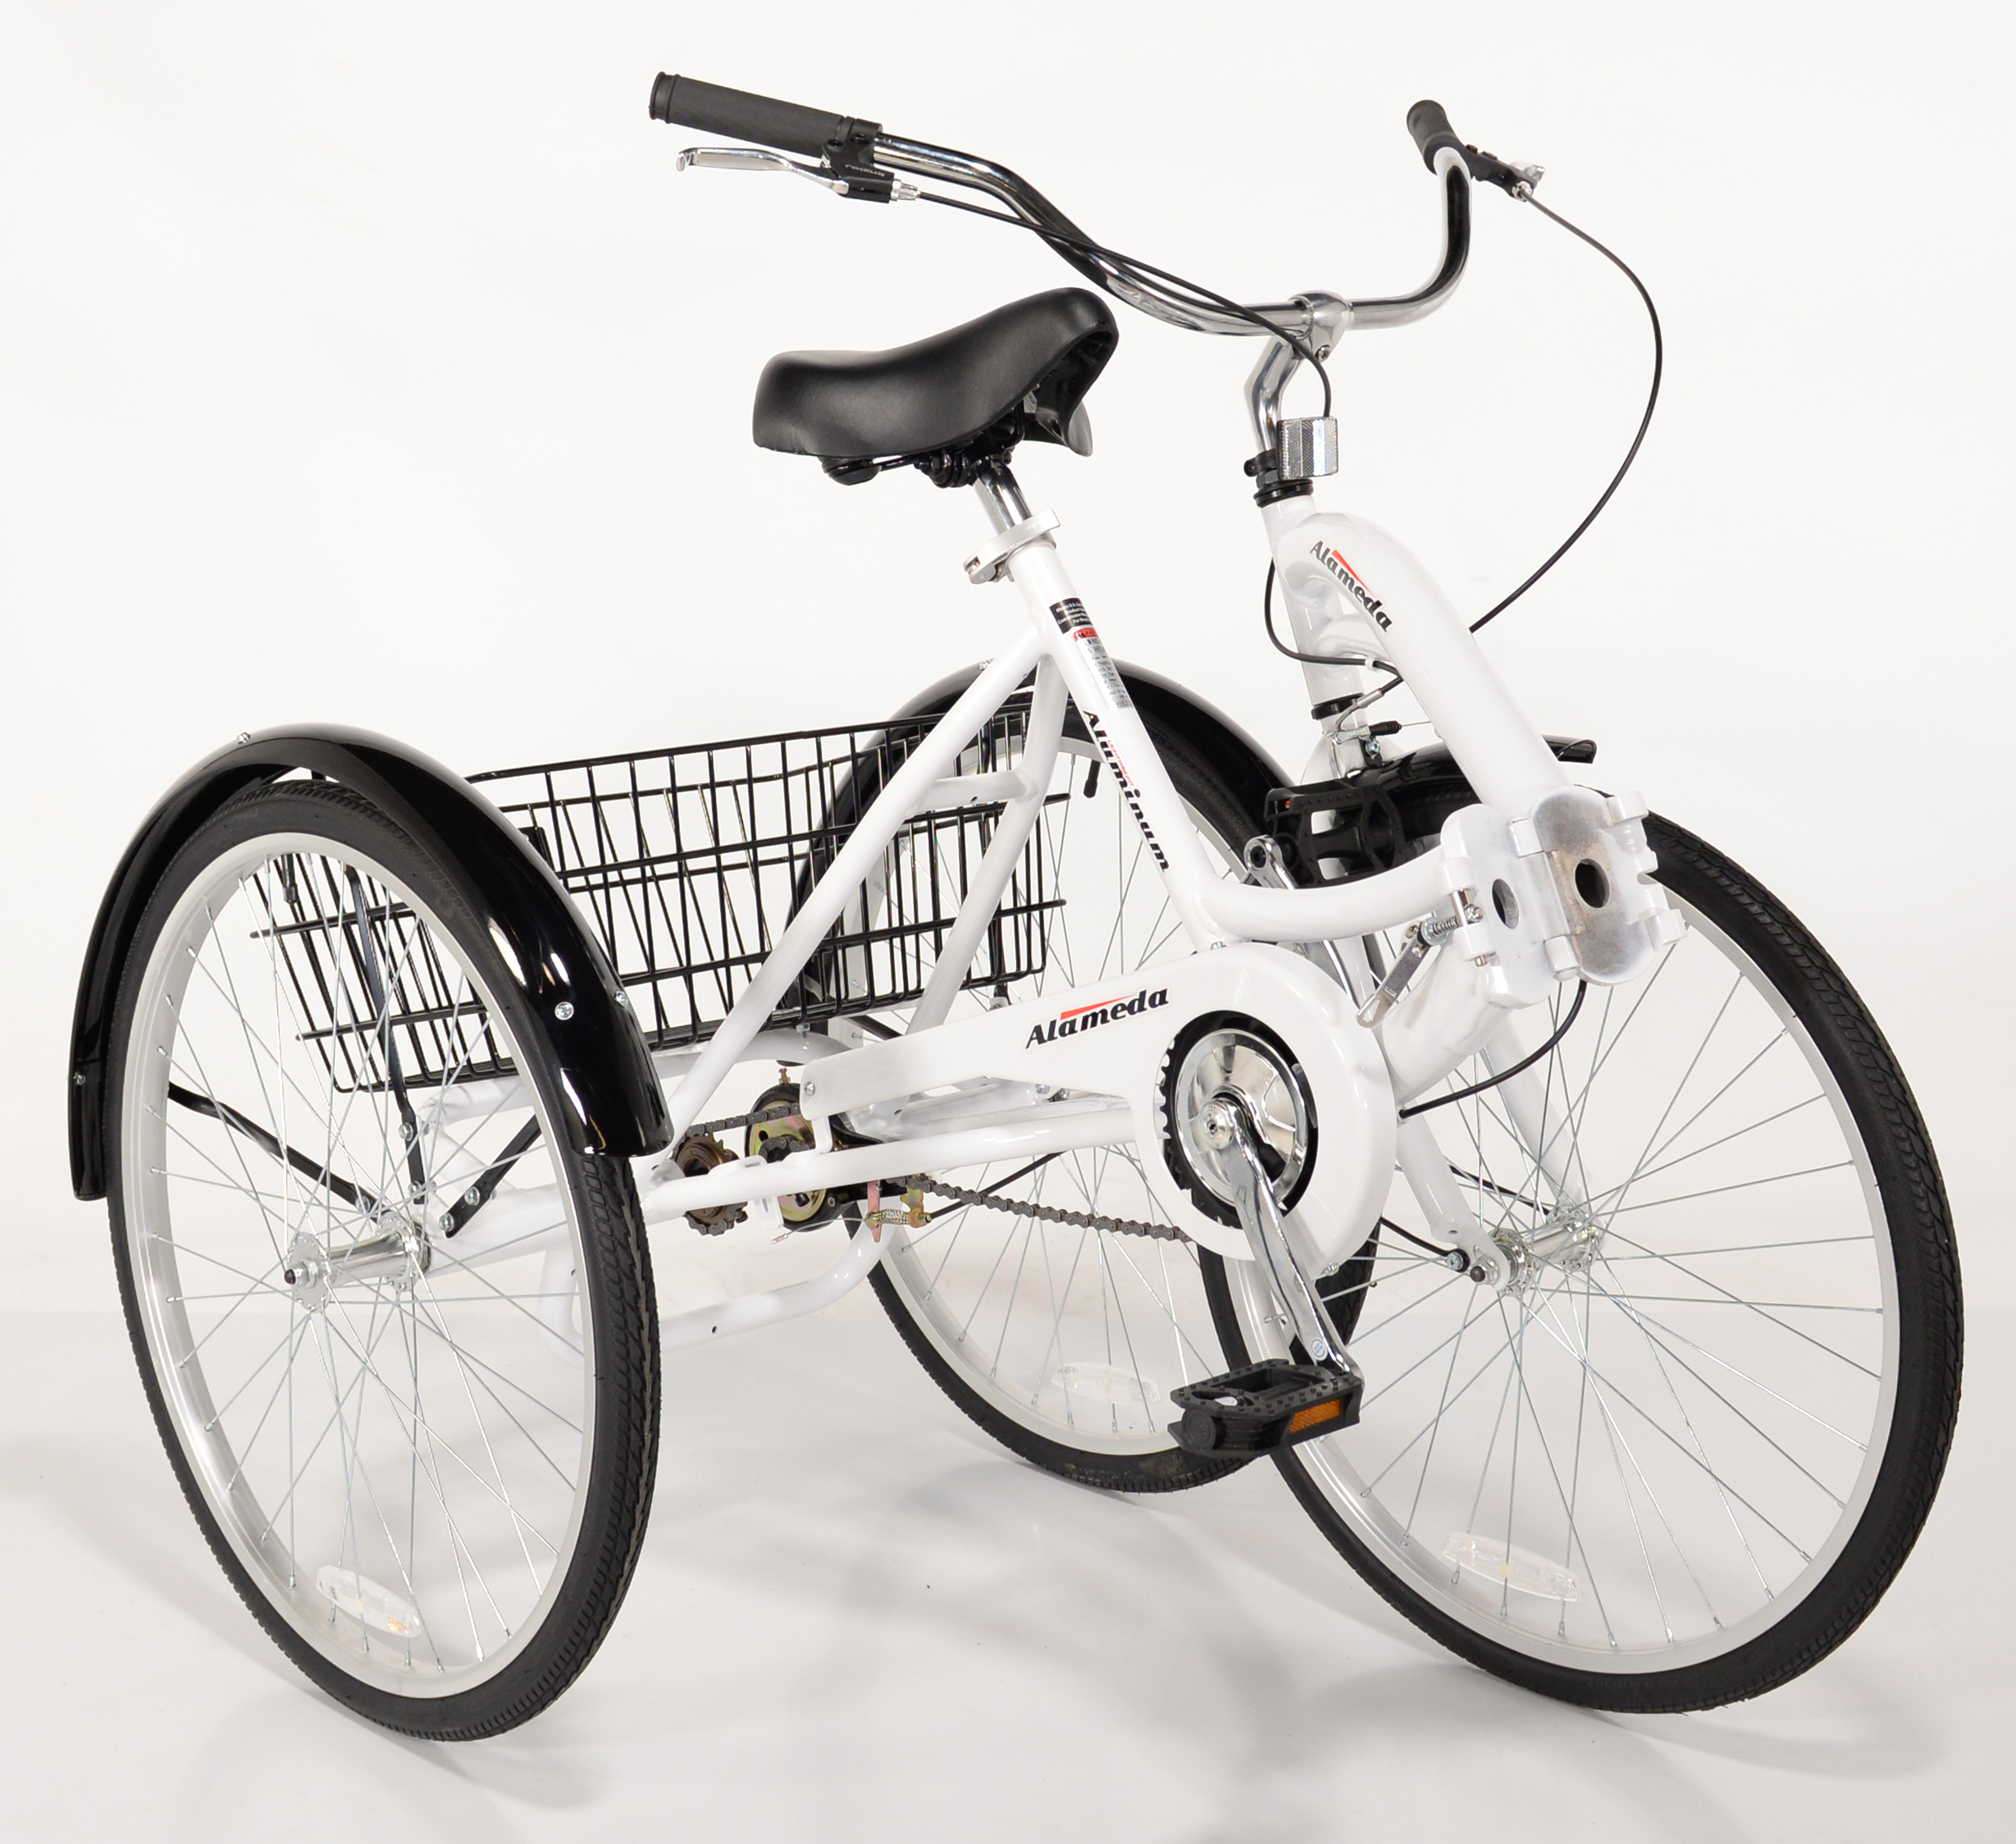 Kent Alameda 3 Wheel Bike Cheap Online